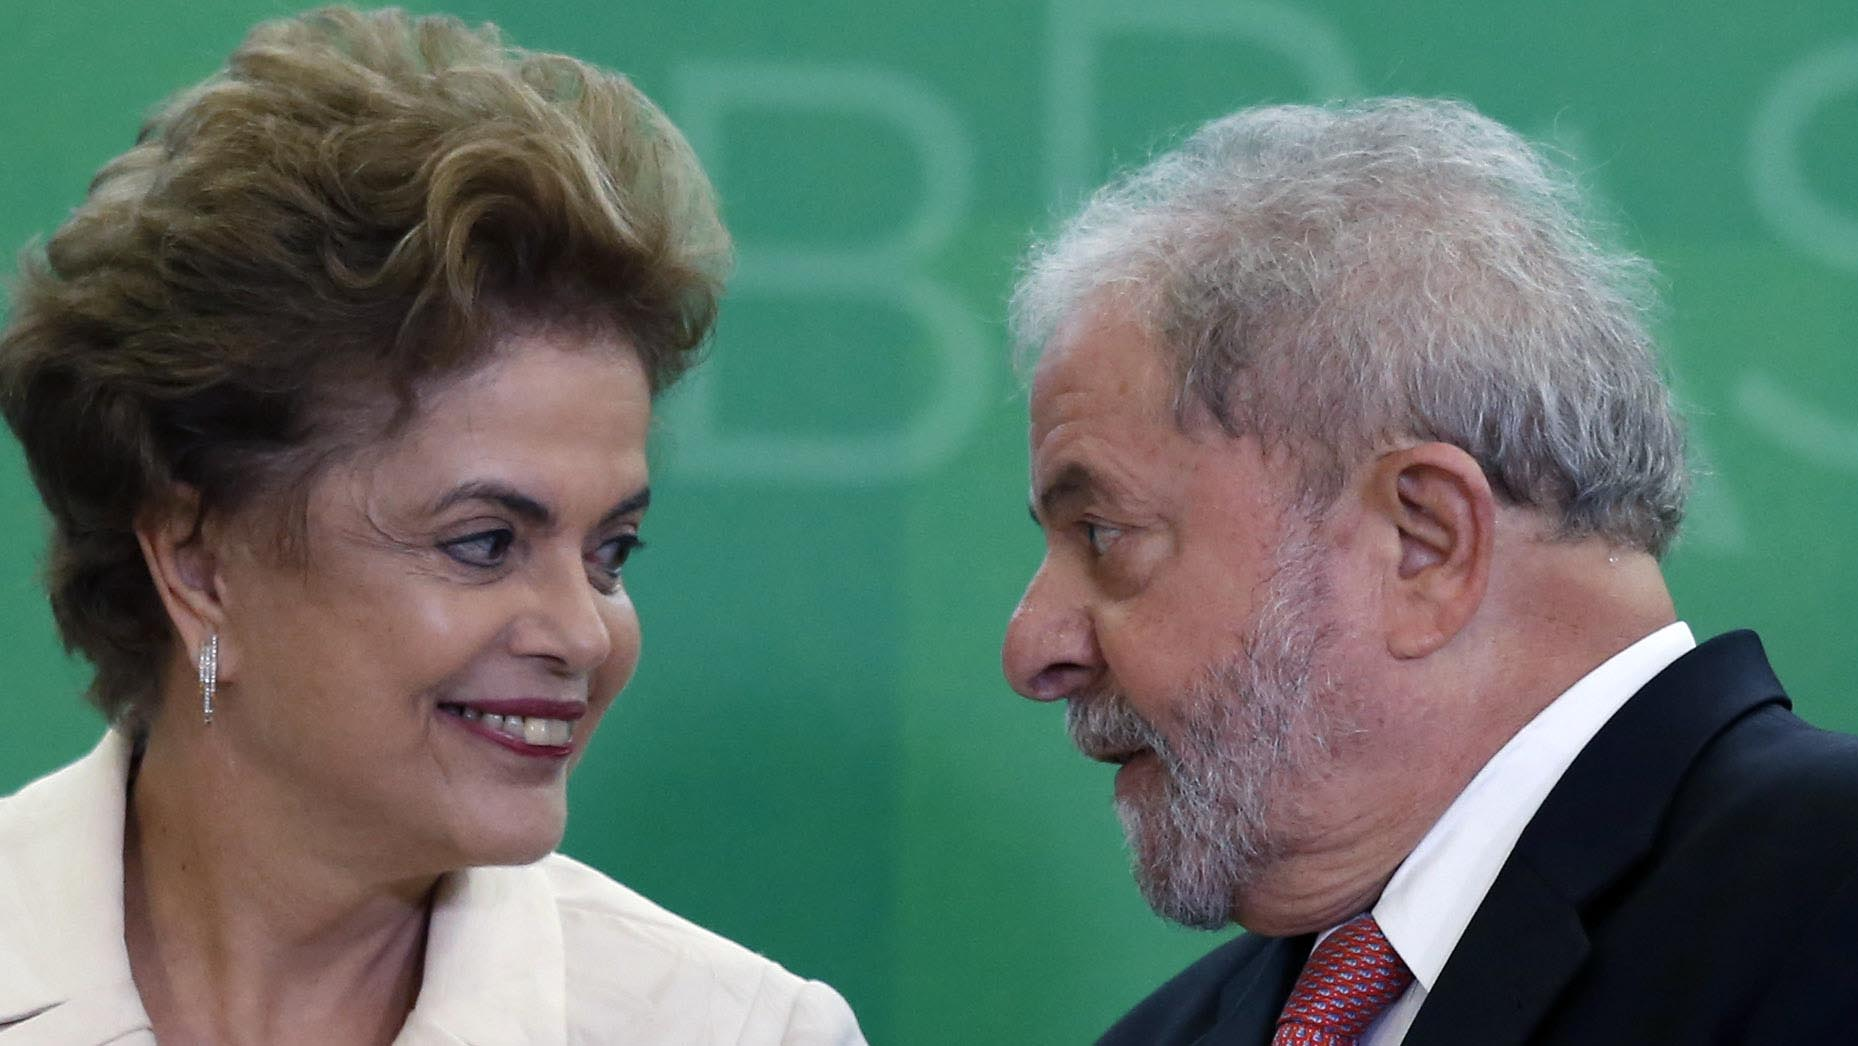 Impeached Brazilian President Dilma Rousseff & former Brazilian President Luiz Inacio Lula da Silva. Source:  Bloomberg